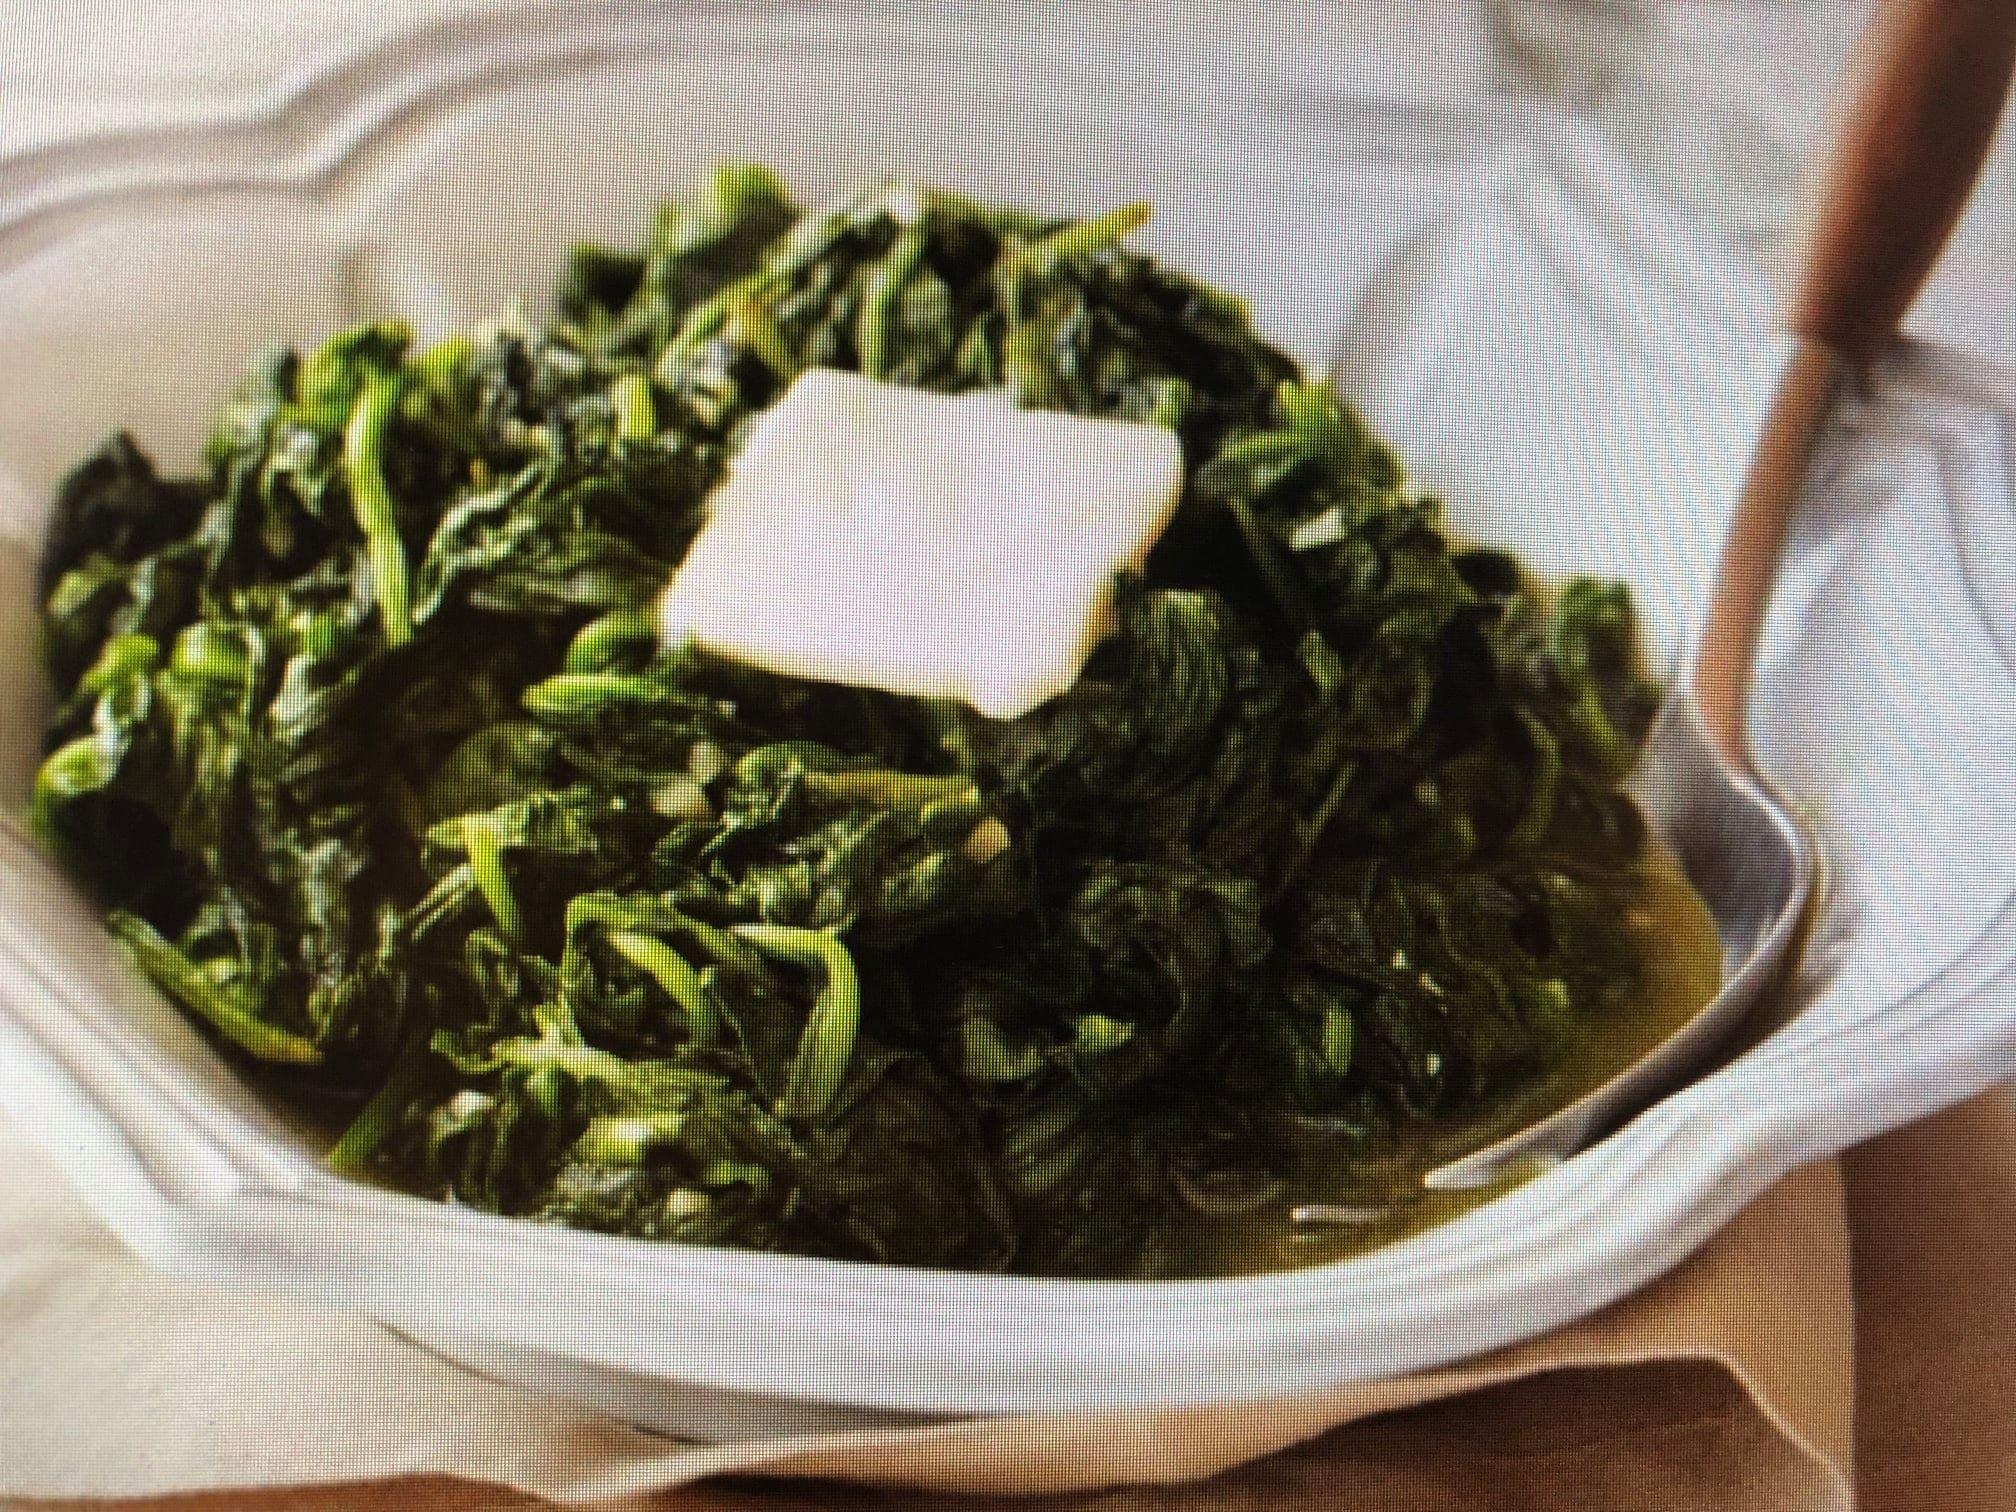 Garlicky Sauteed Fresh Spinach